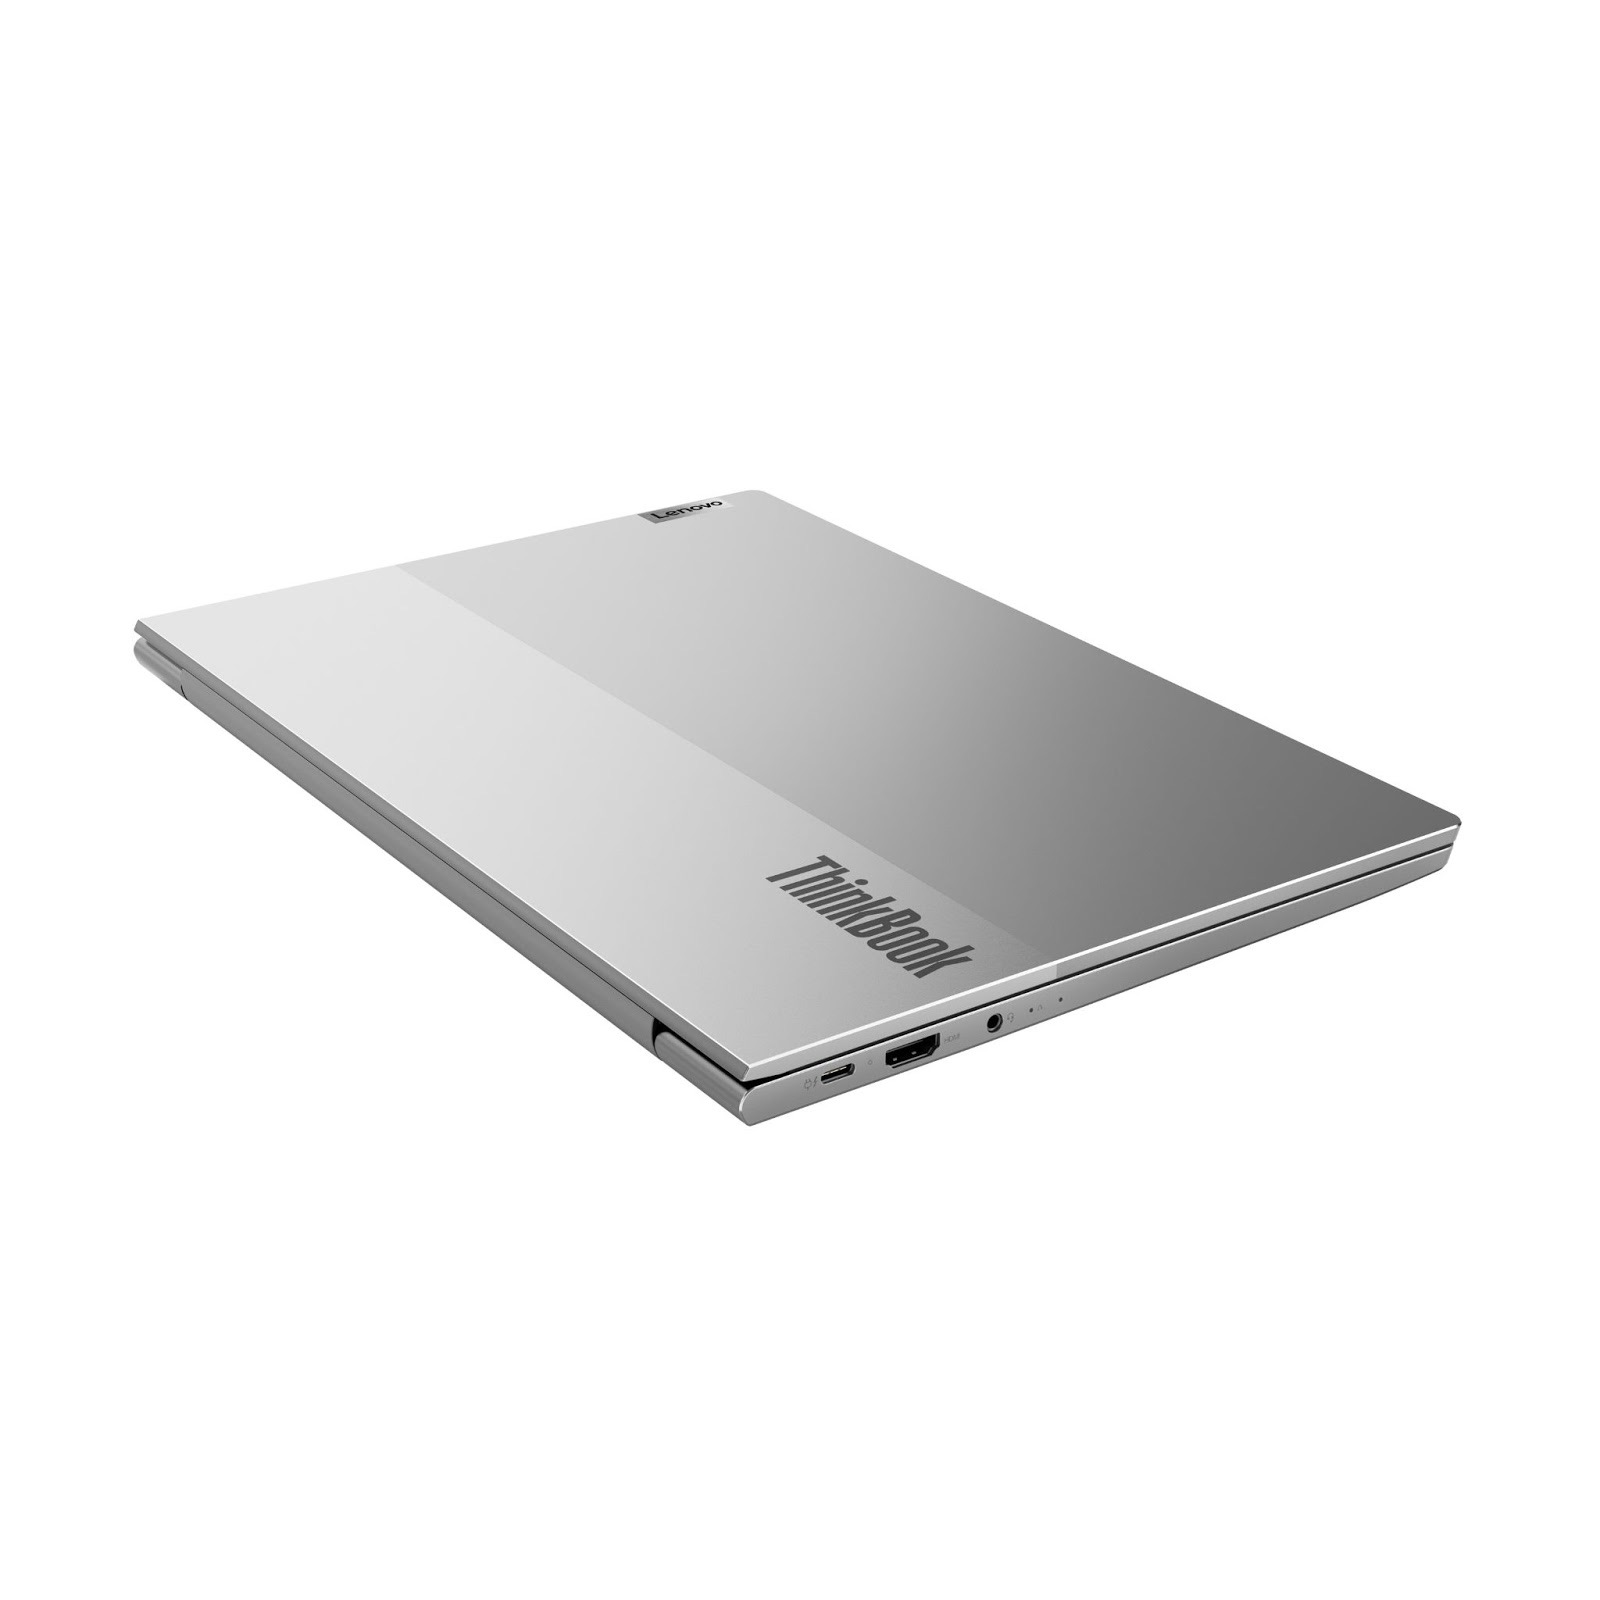 Фото 4. Ноутбук Lenovo ThinkBook 13s Gen 2 ITL (20V9003TRU)